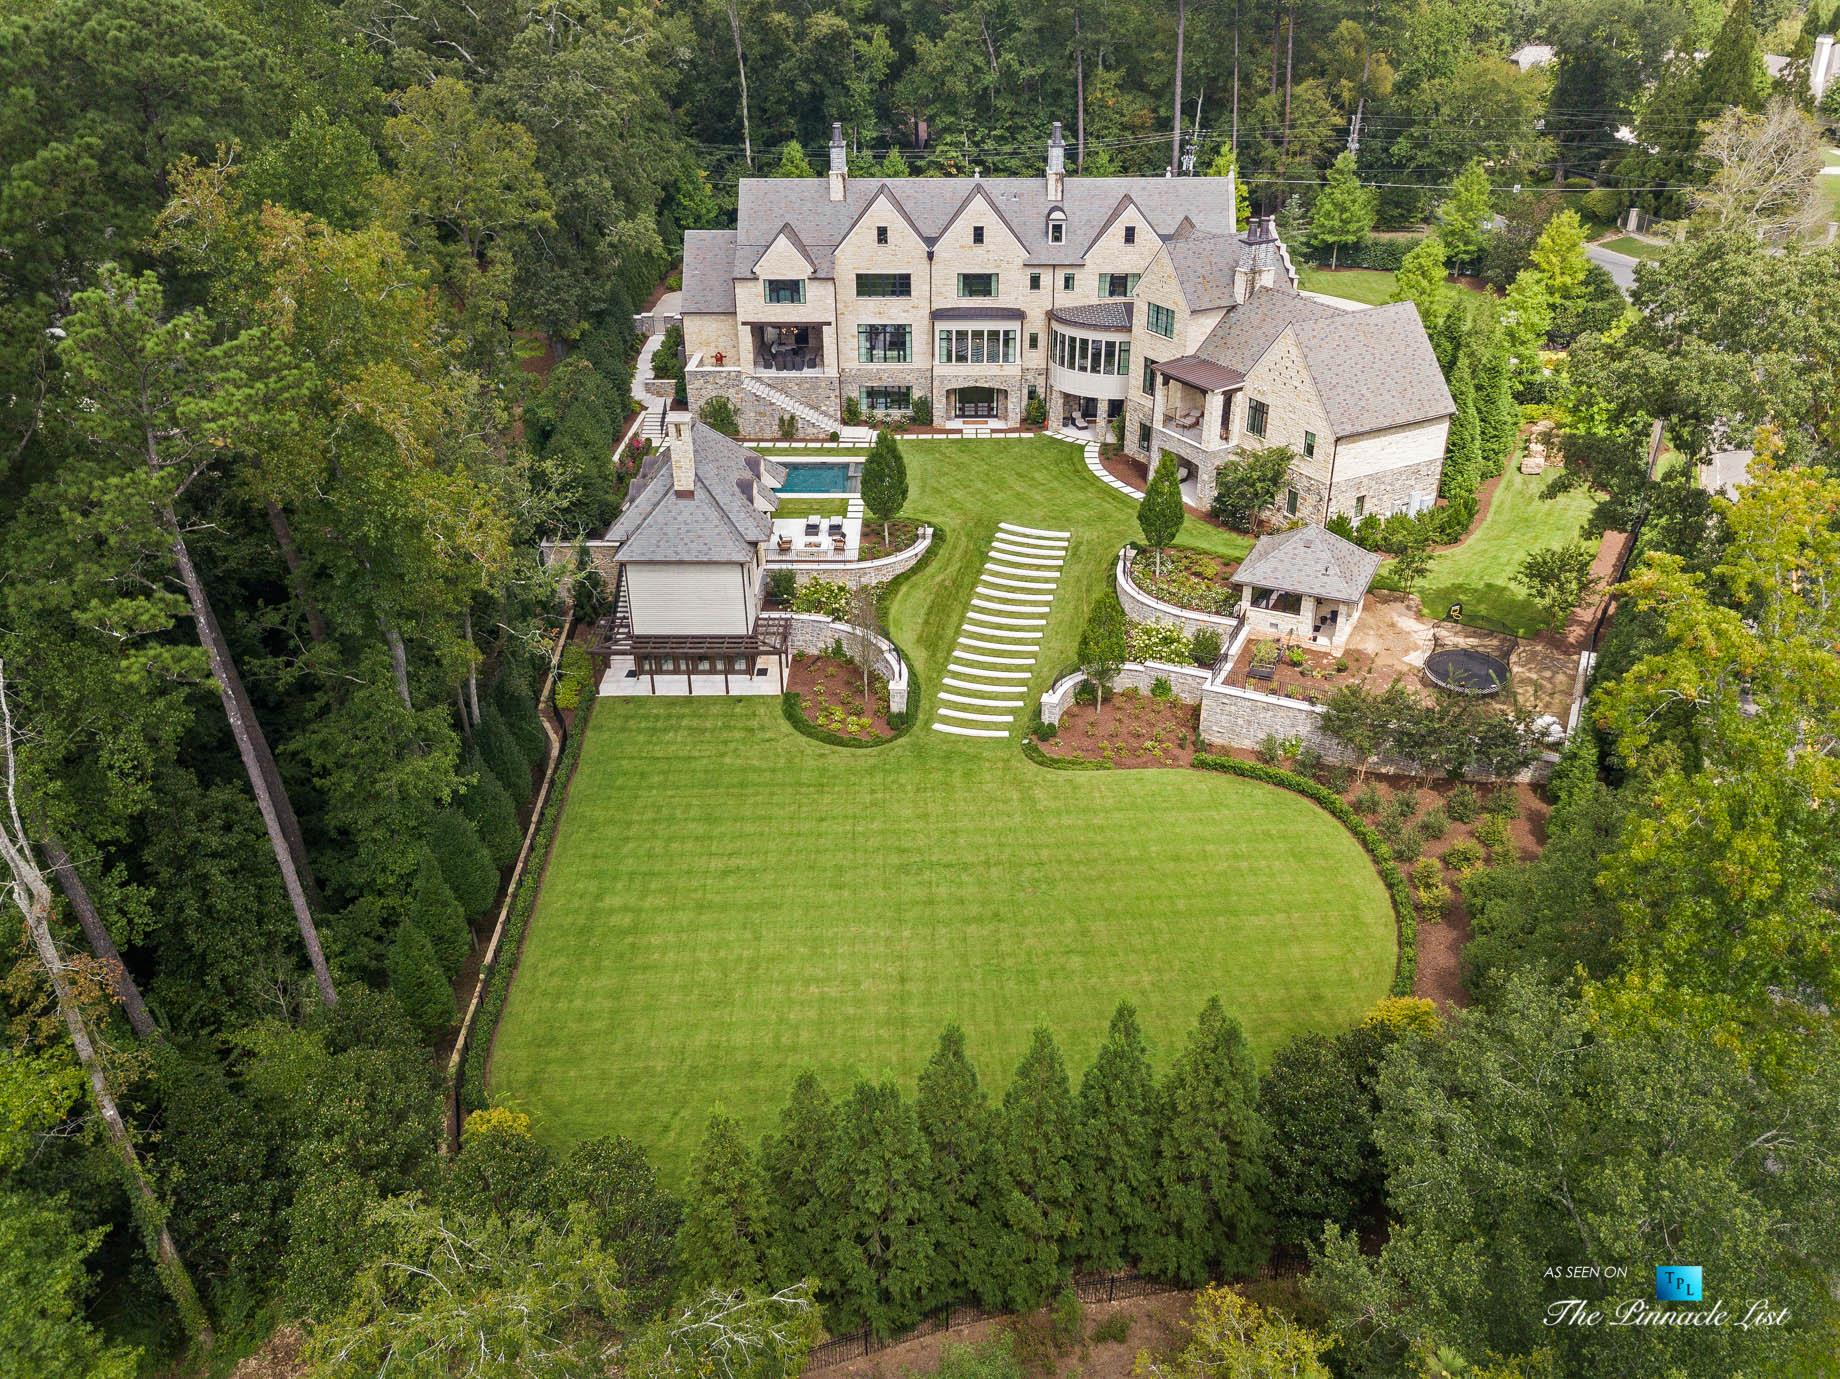 1150 W Garmon Rd, Atlanta, GA, USA – Drone Aerial Backyard Property Grounds View – Luxury Real Estate – Buckhead Estate House